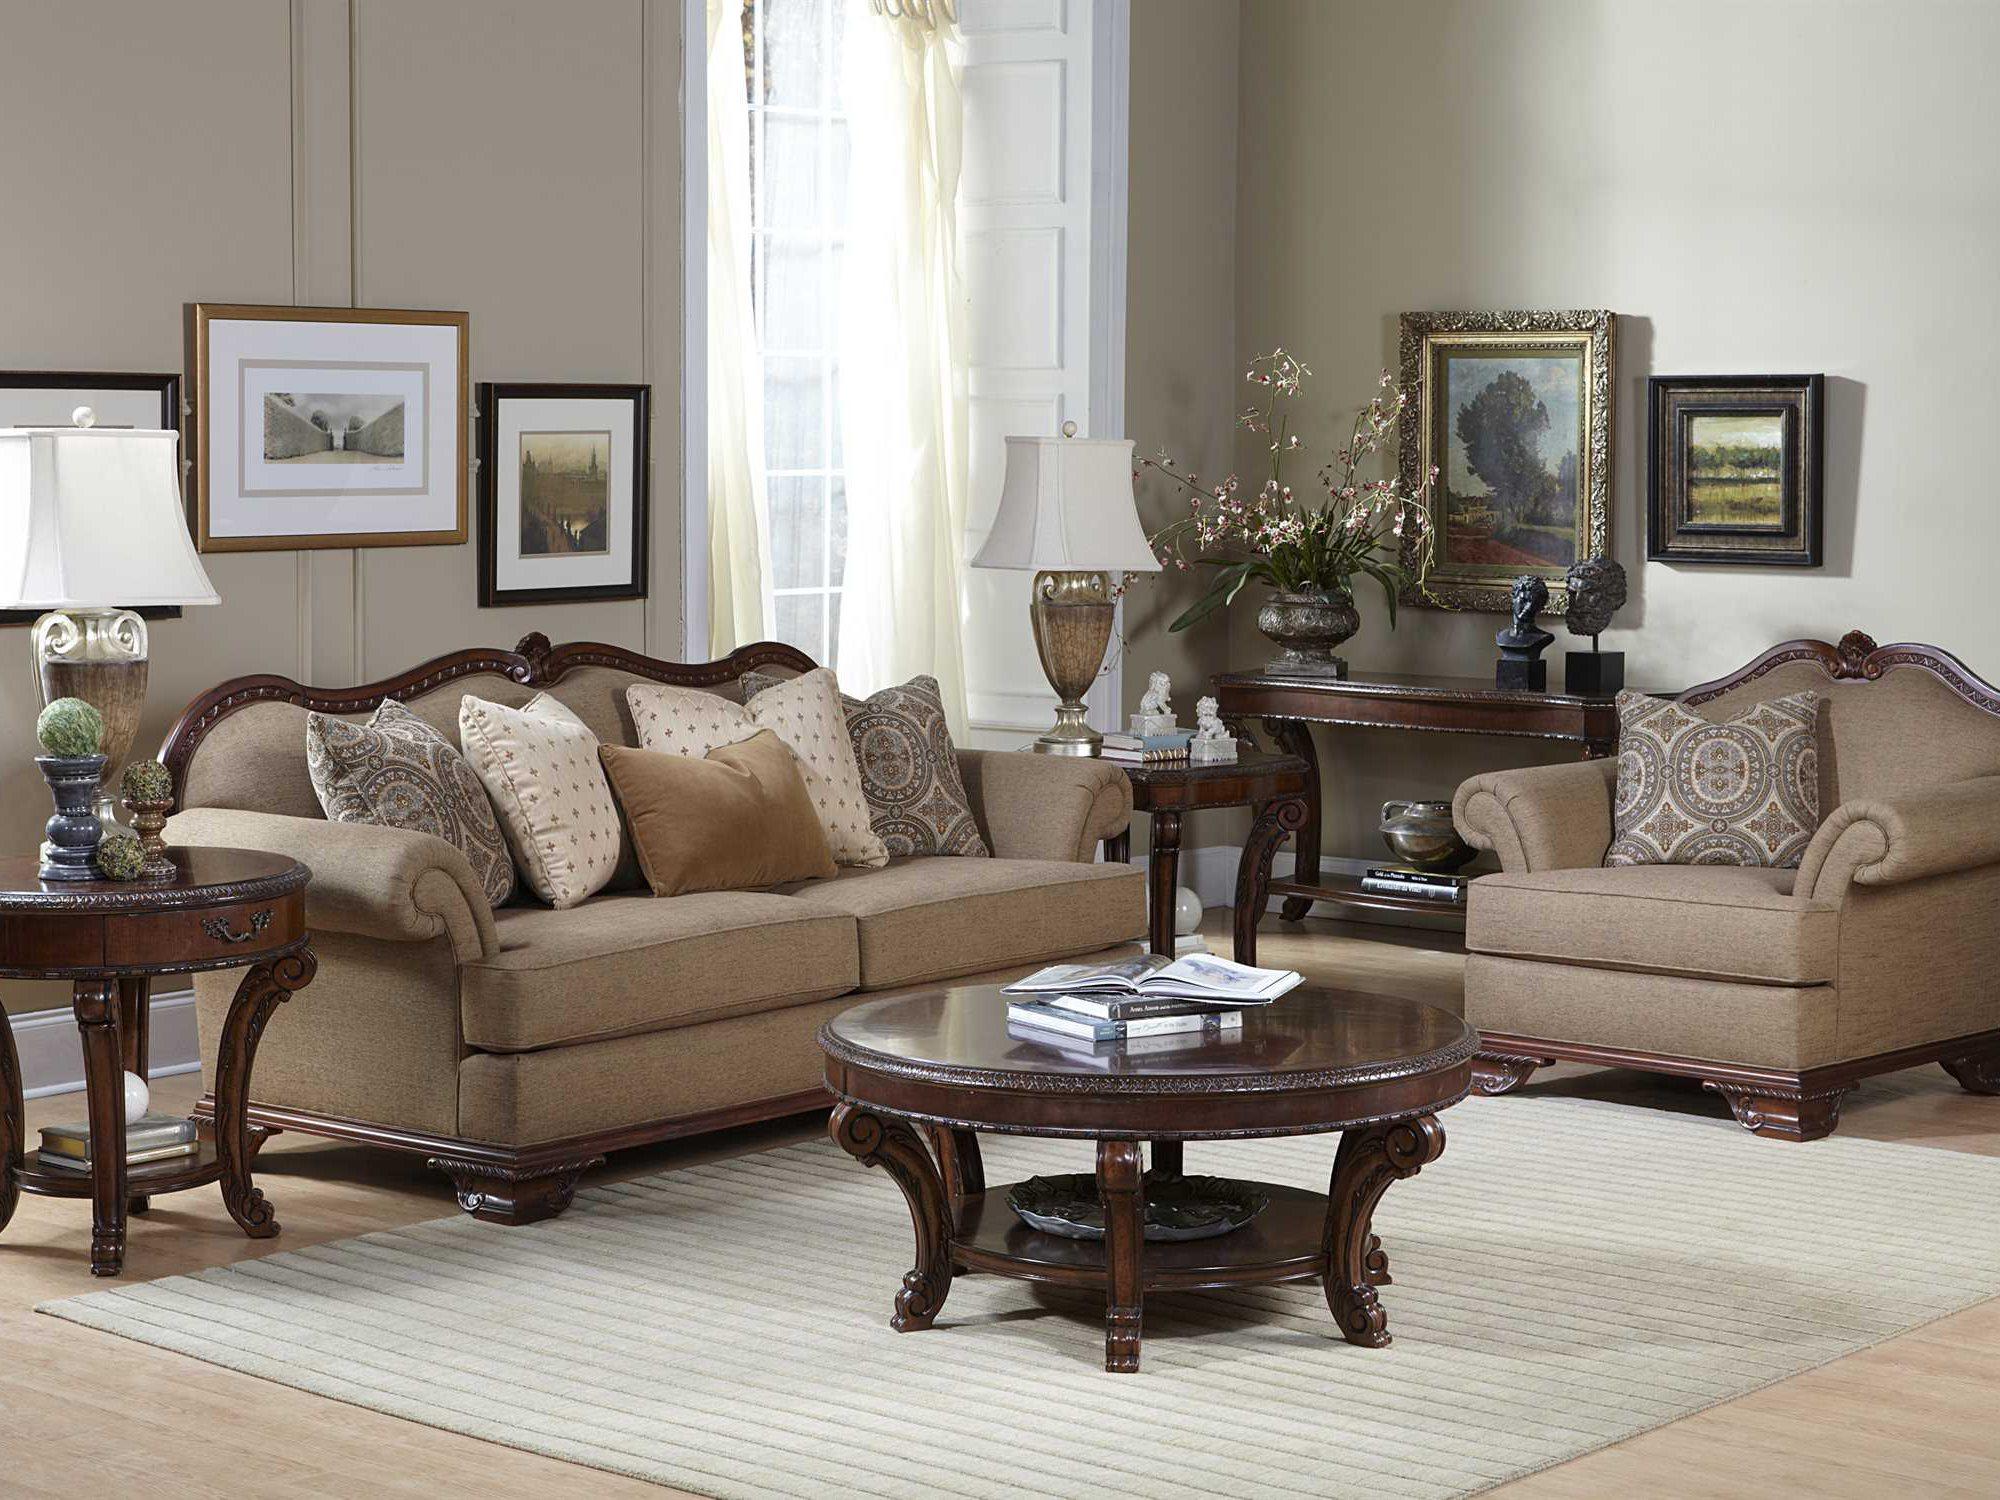 A R T Furniture Old World Living Room Set